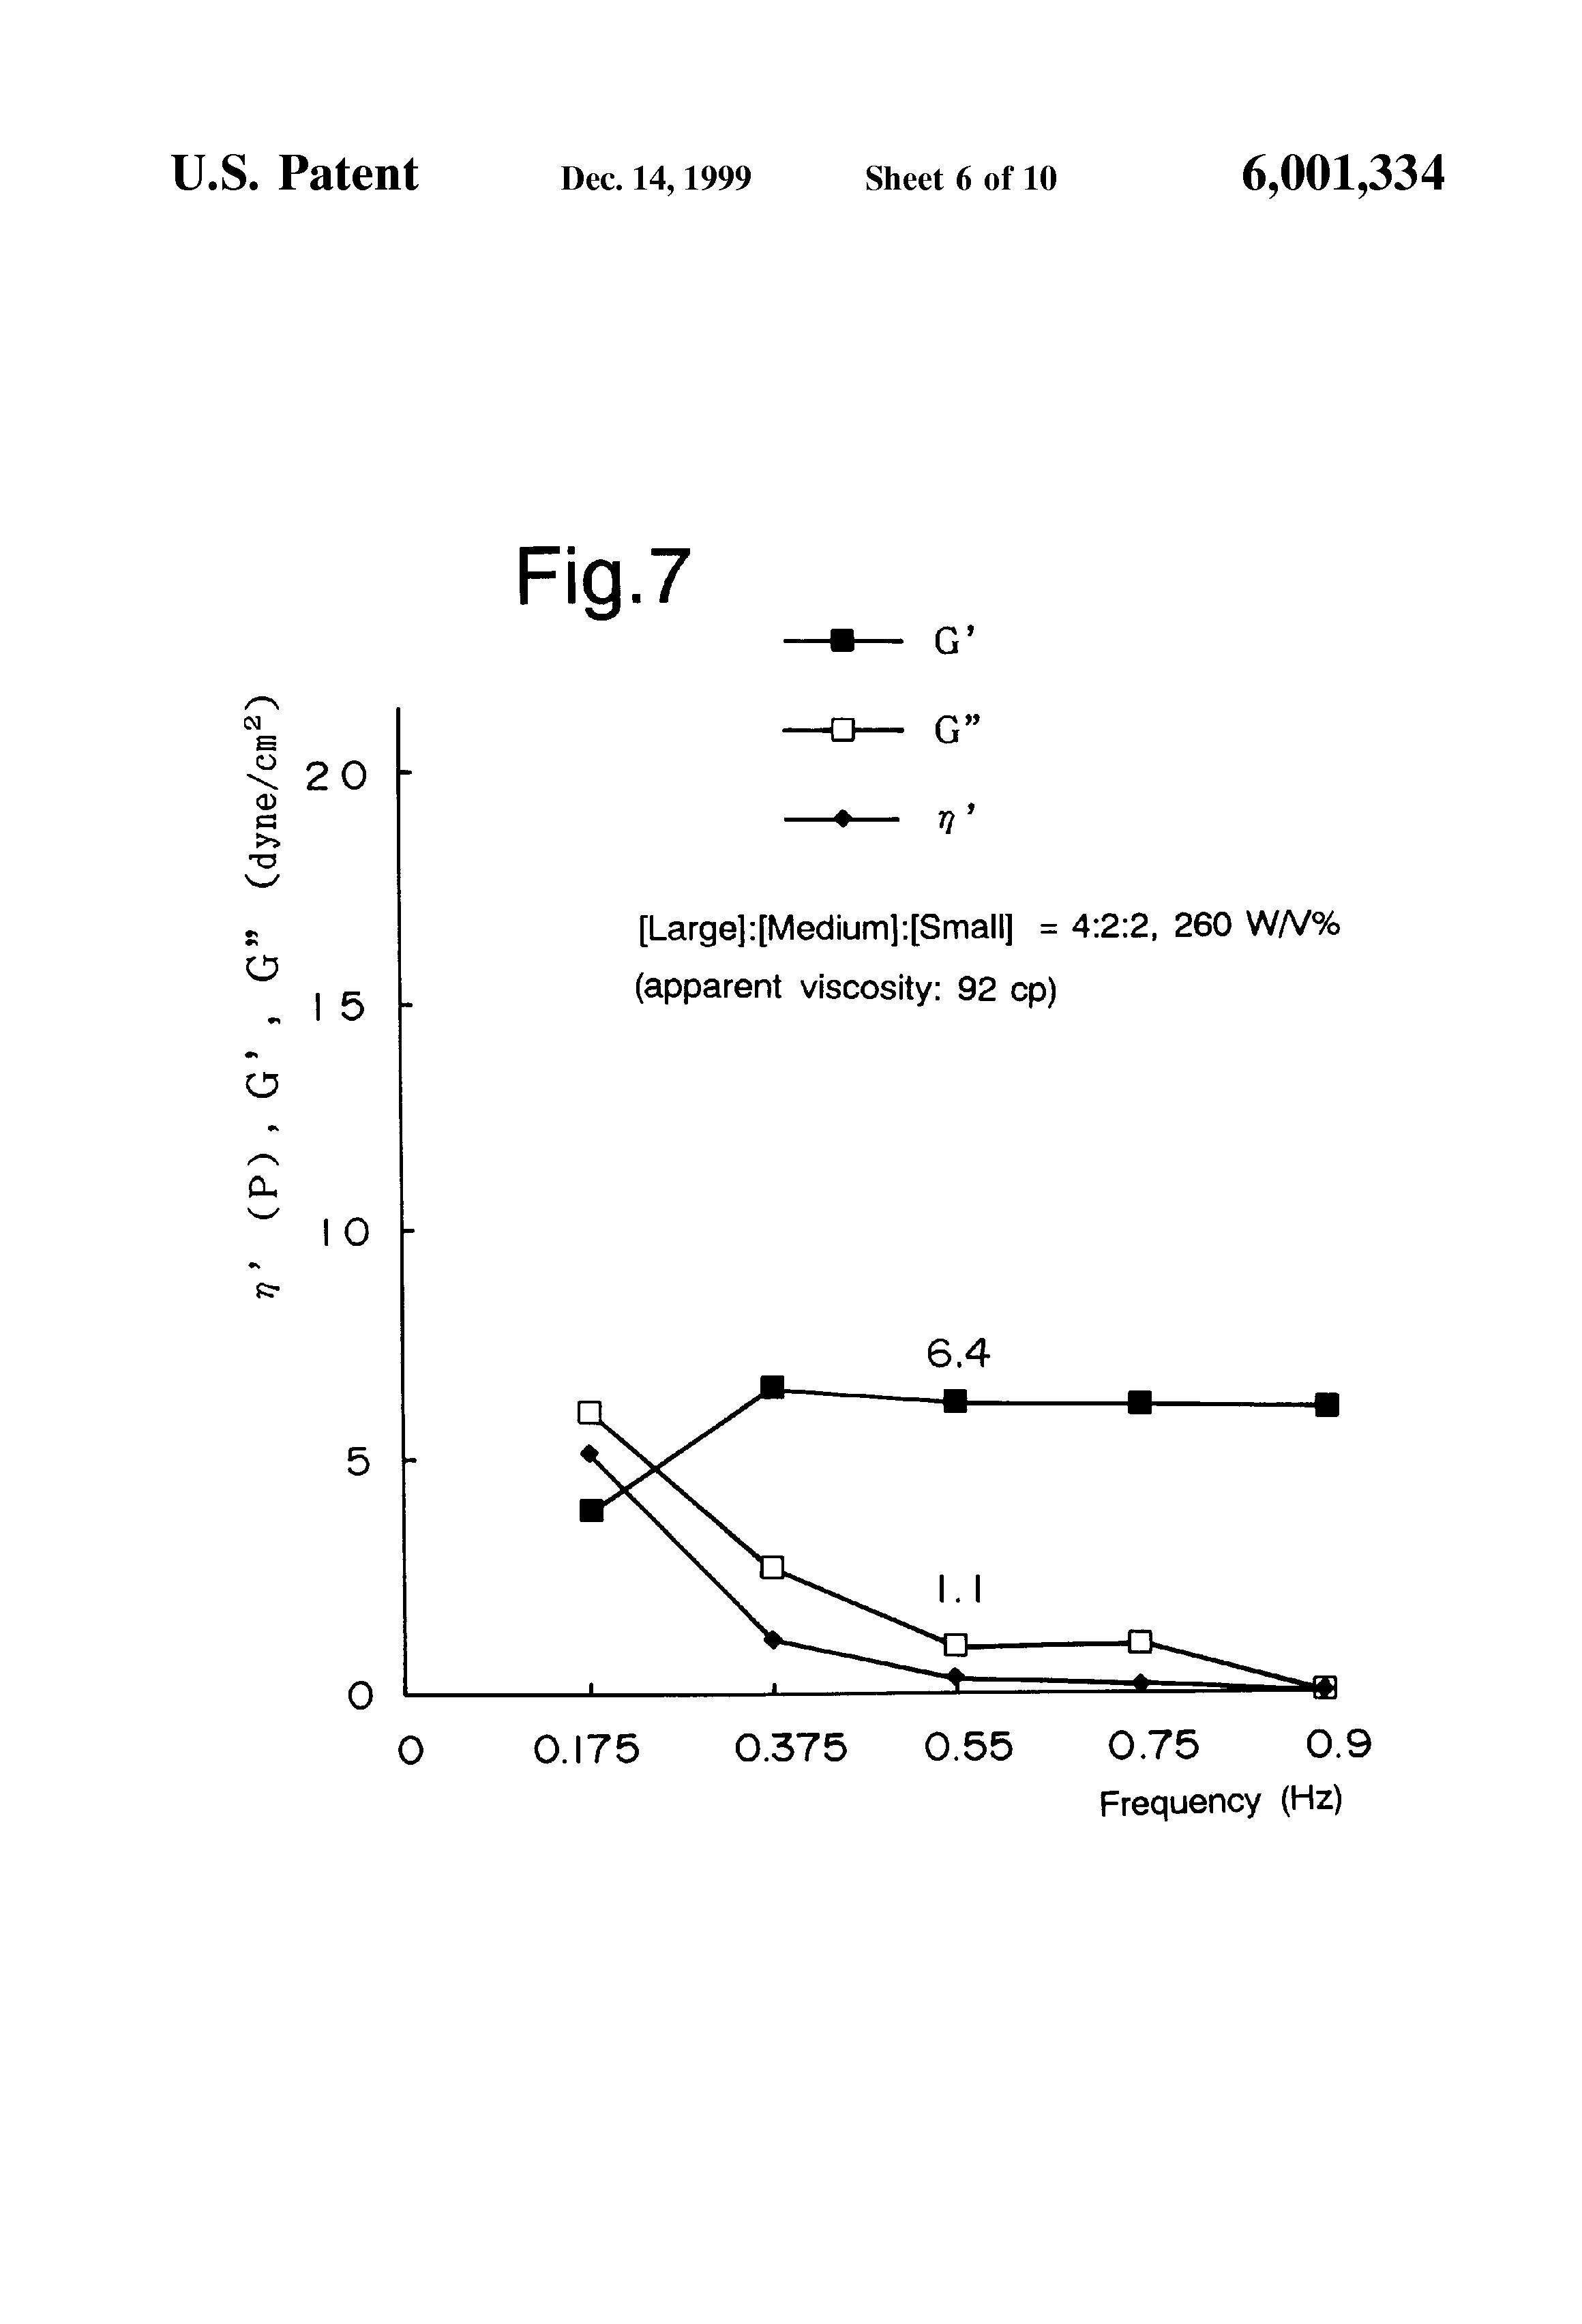 barium sulfate powder mixing instructions